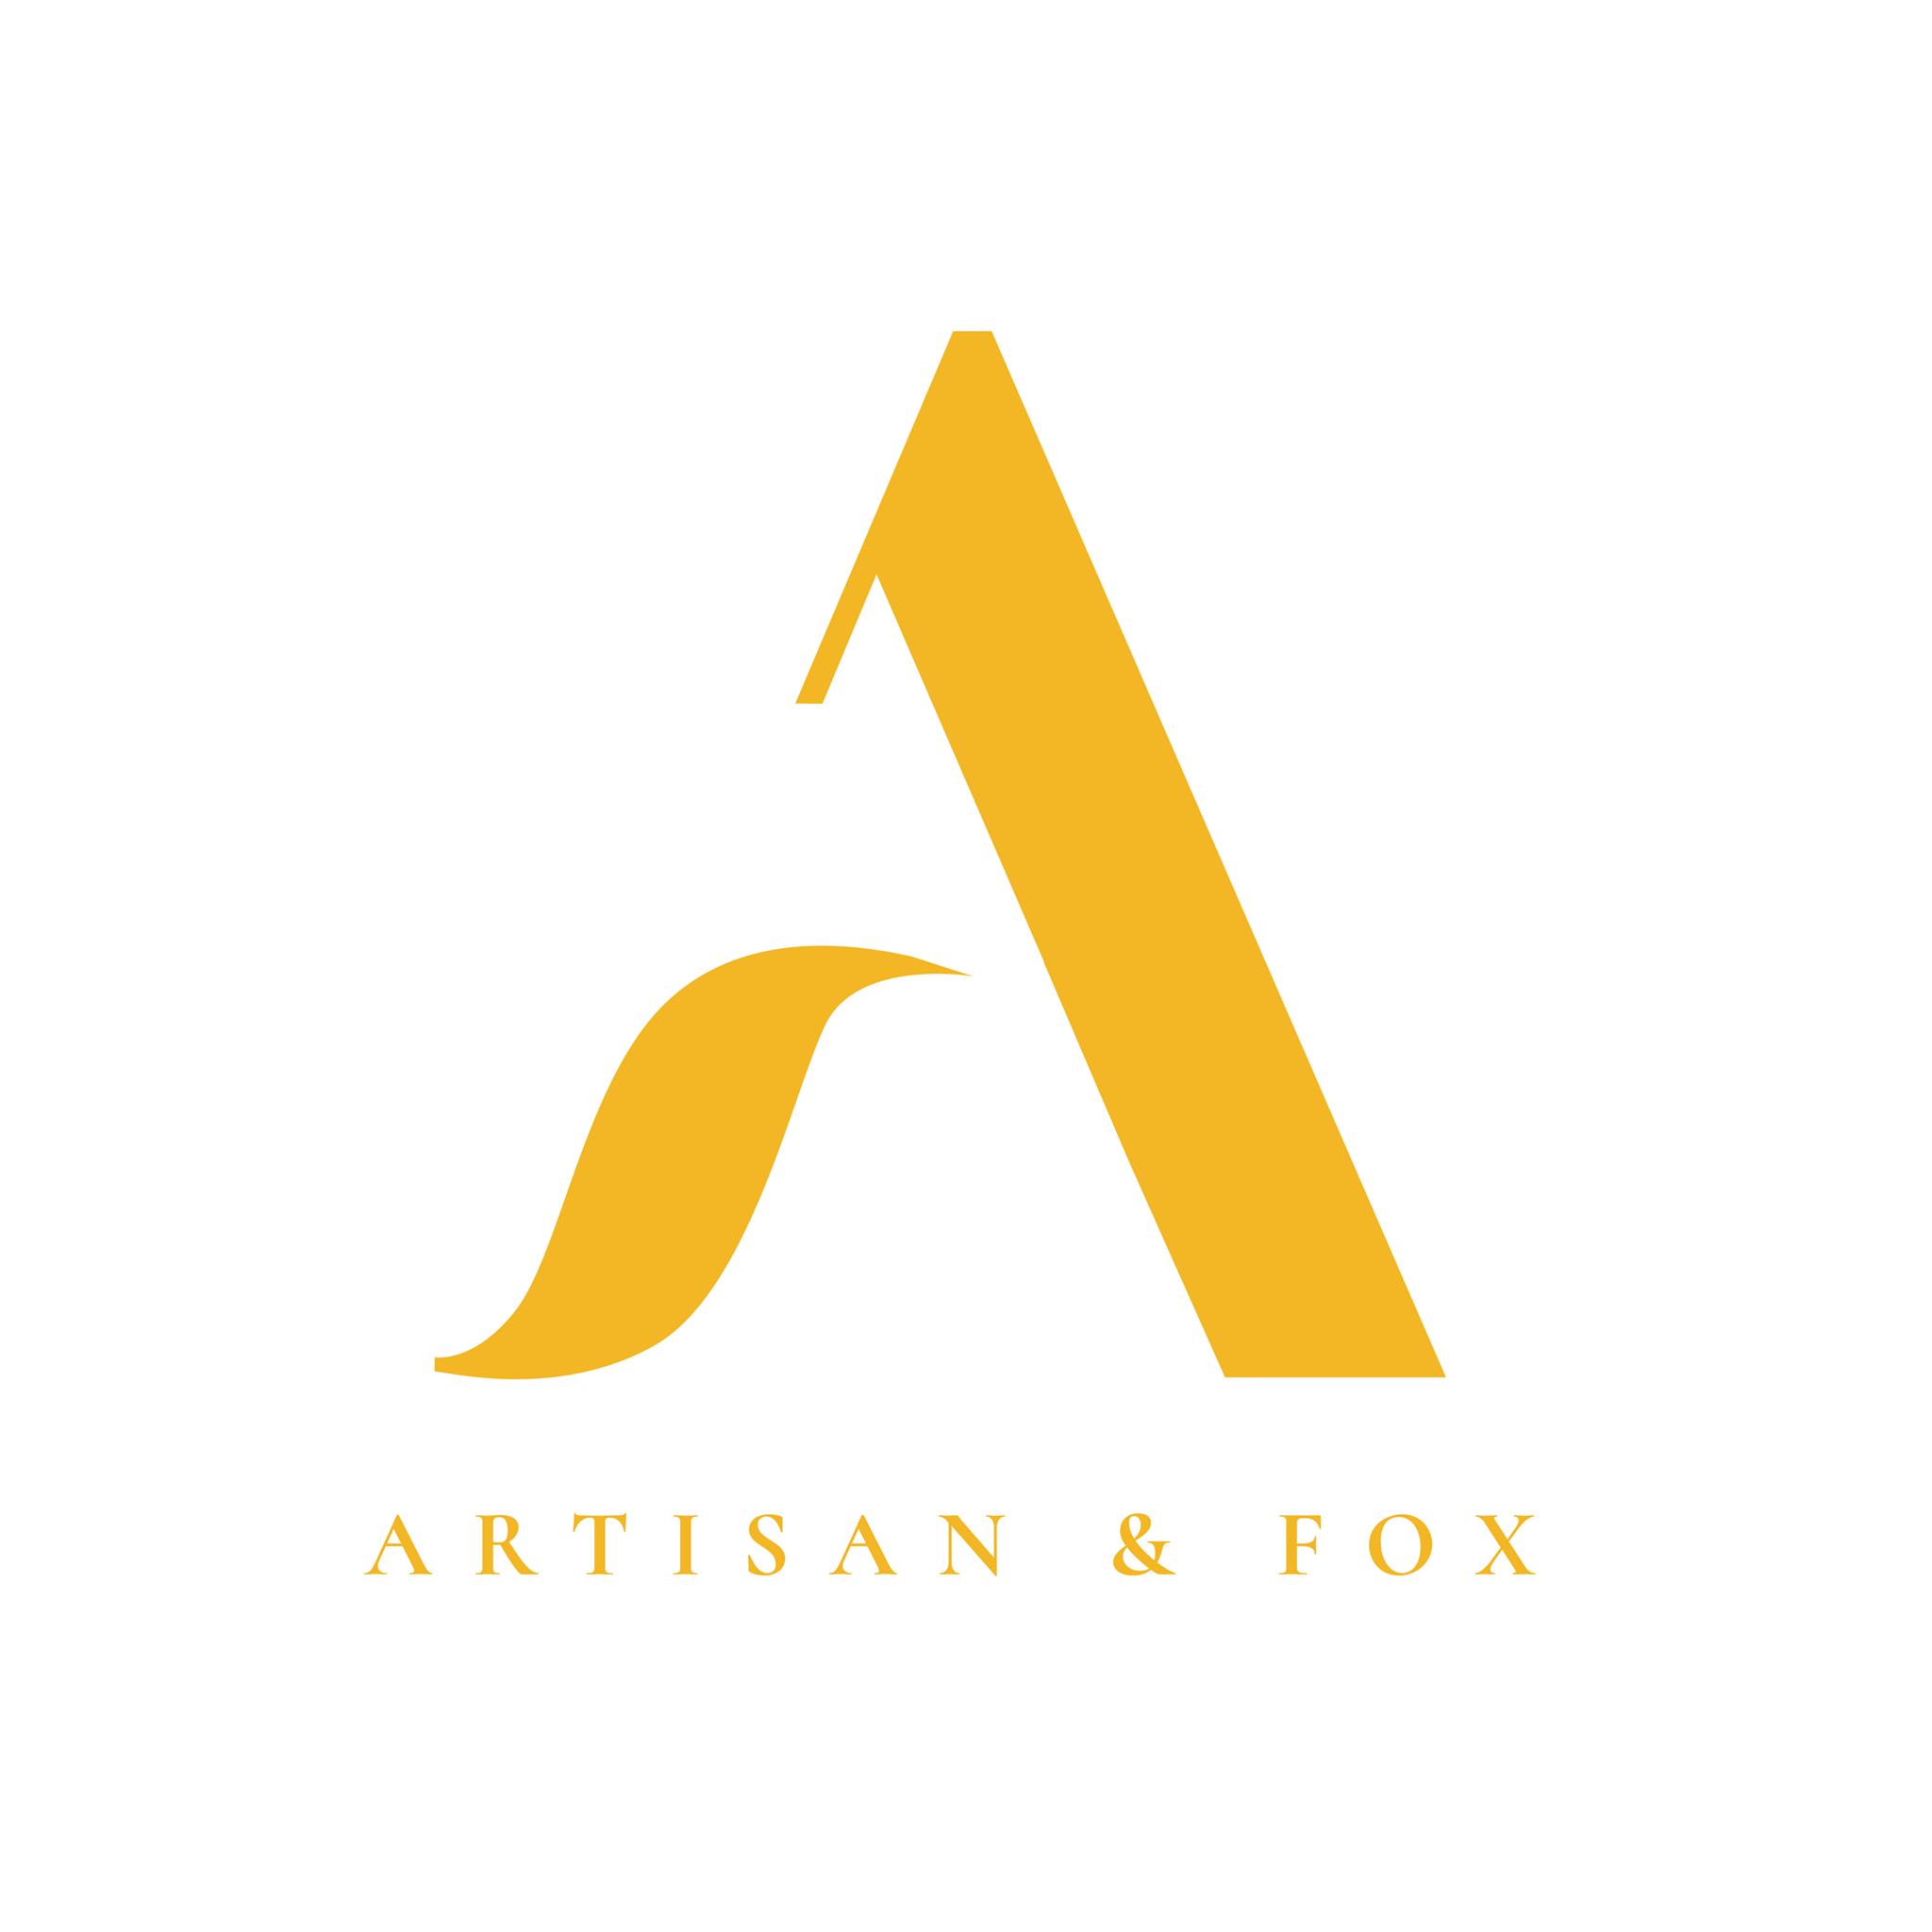 artisan-and-fox.png